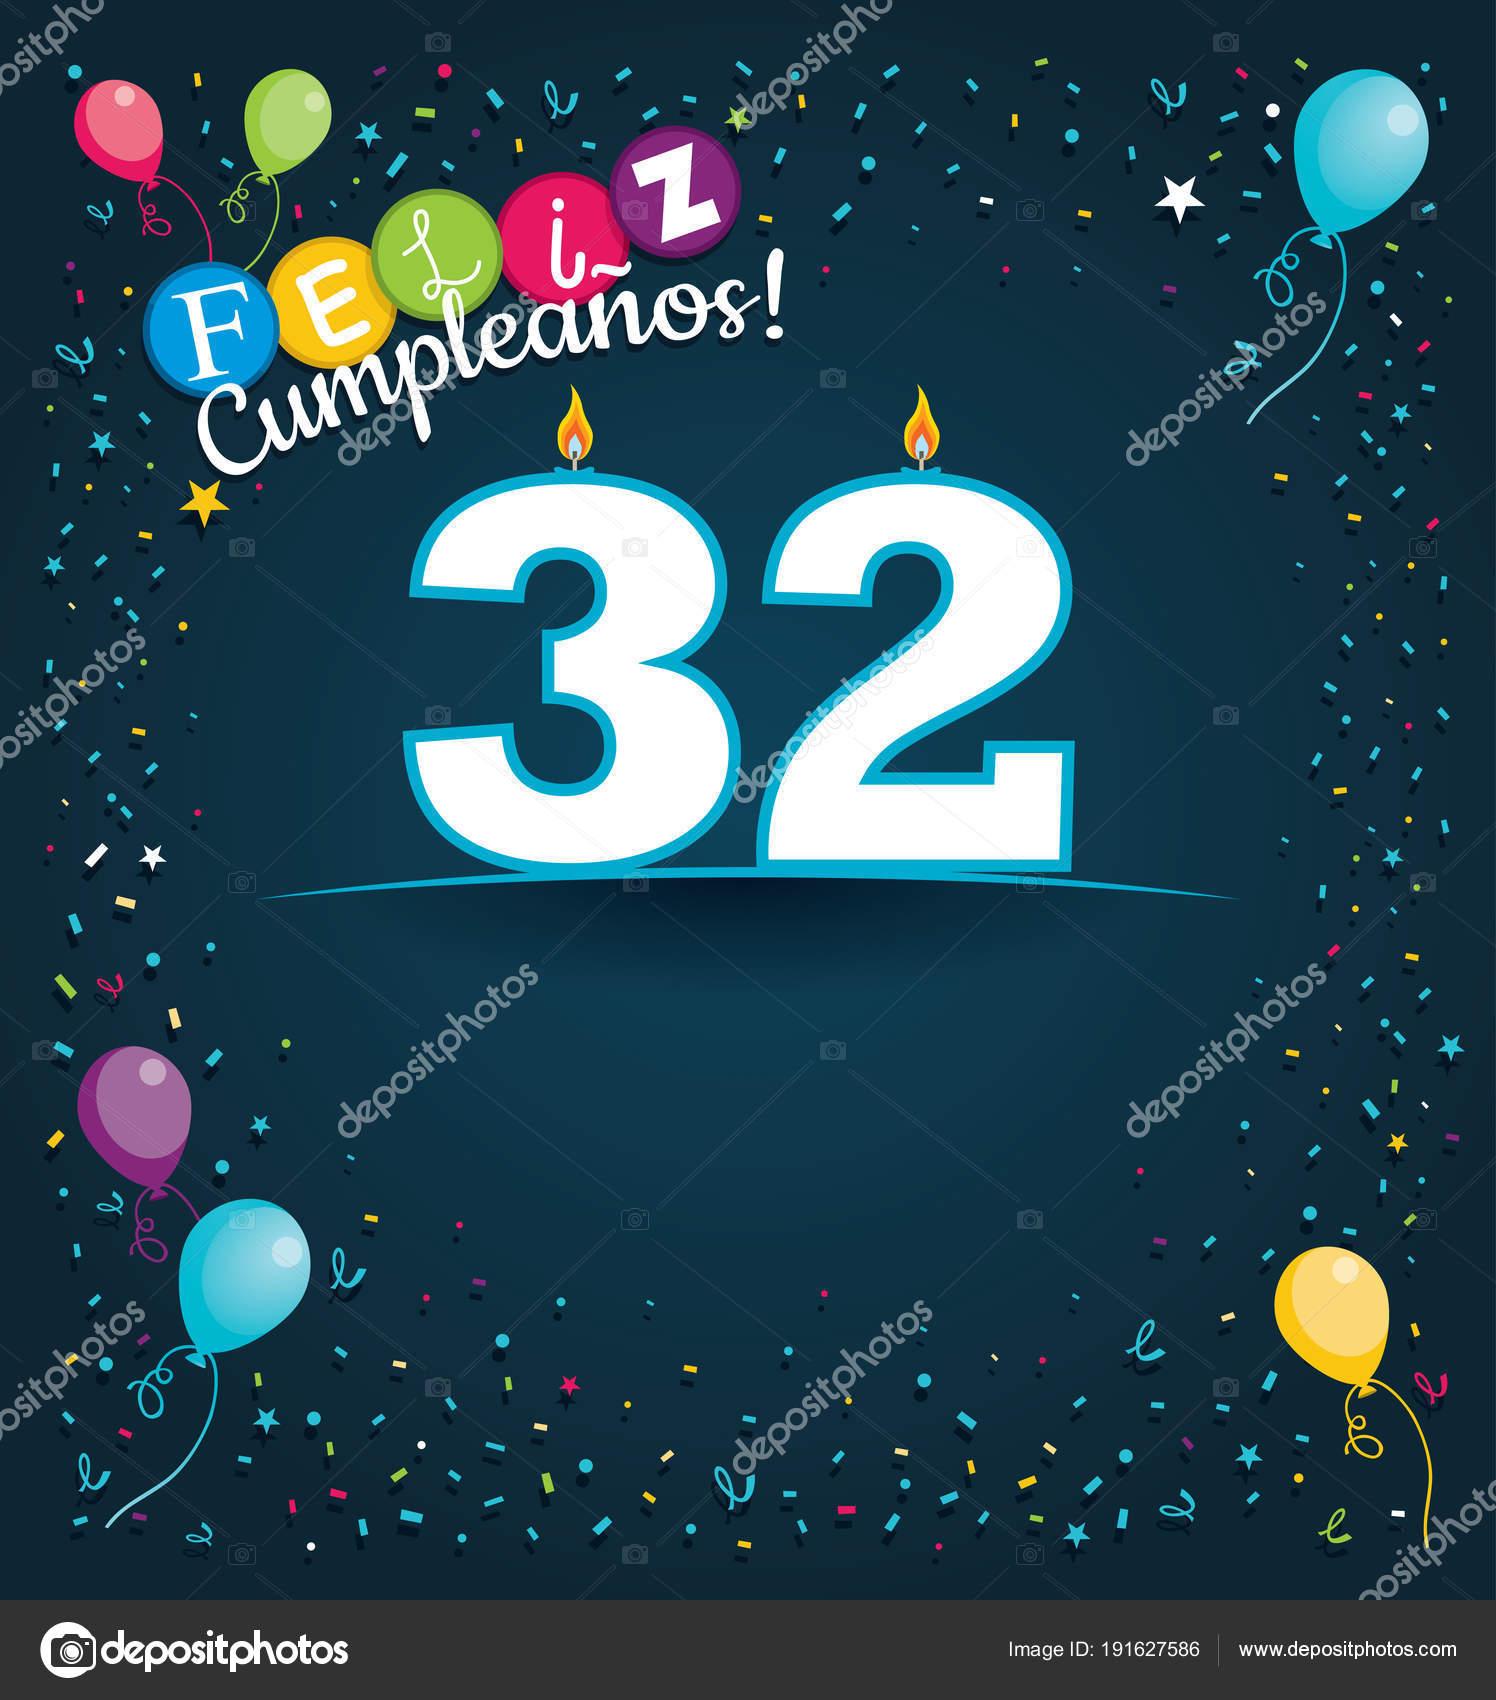 Feliz Cumpleanos Happy Birthday Spanish Language Greeting Card White